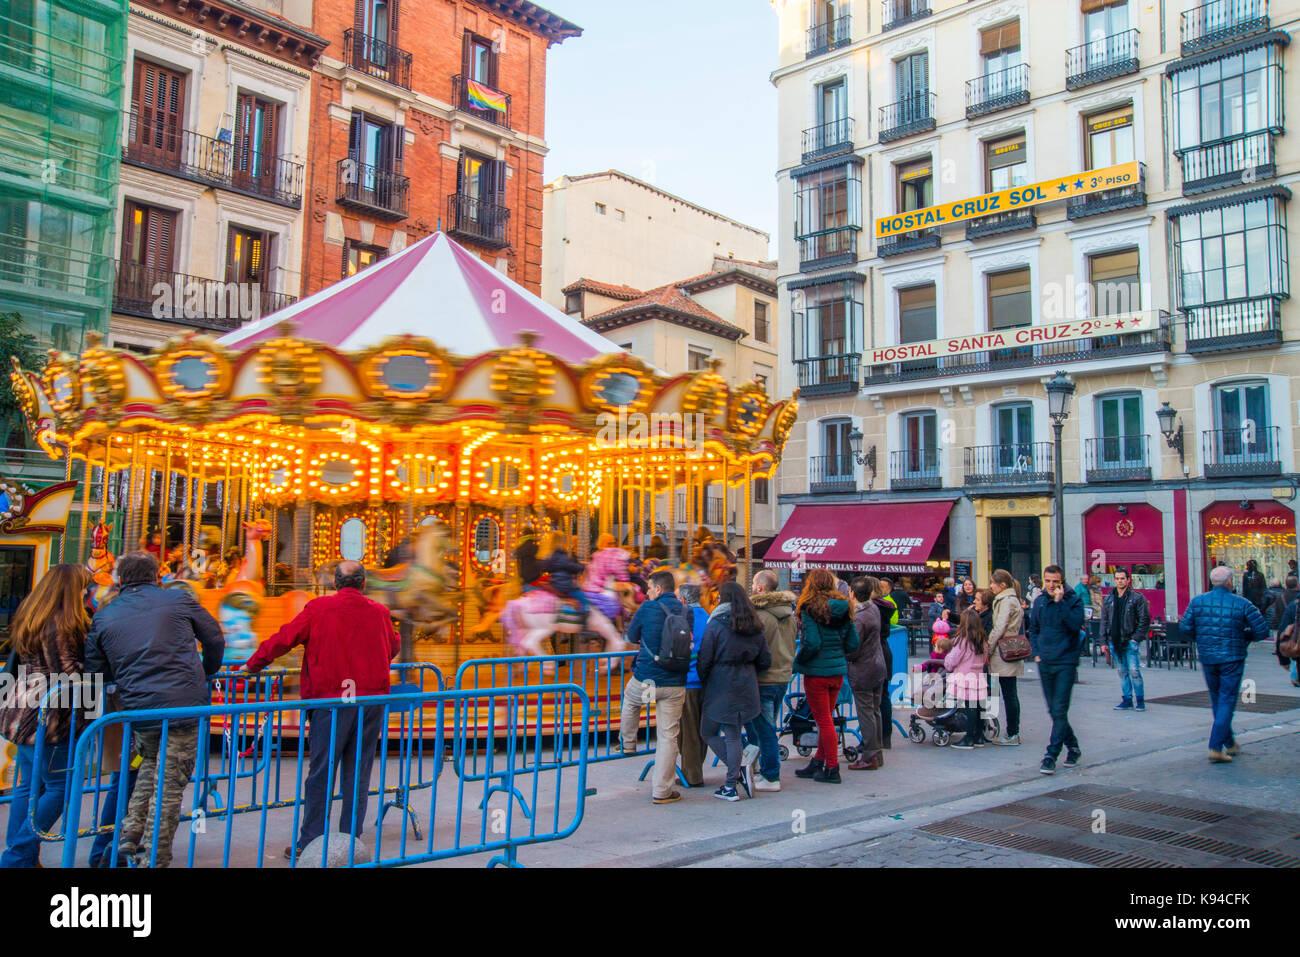 Carousel At Christmas Time Santa Cruz Square Madrid Spain